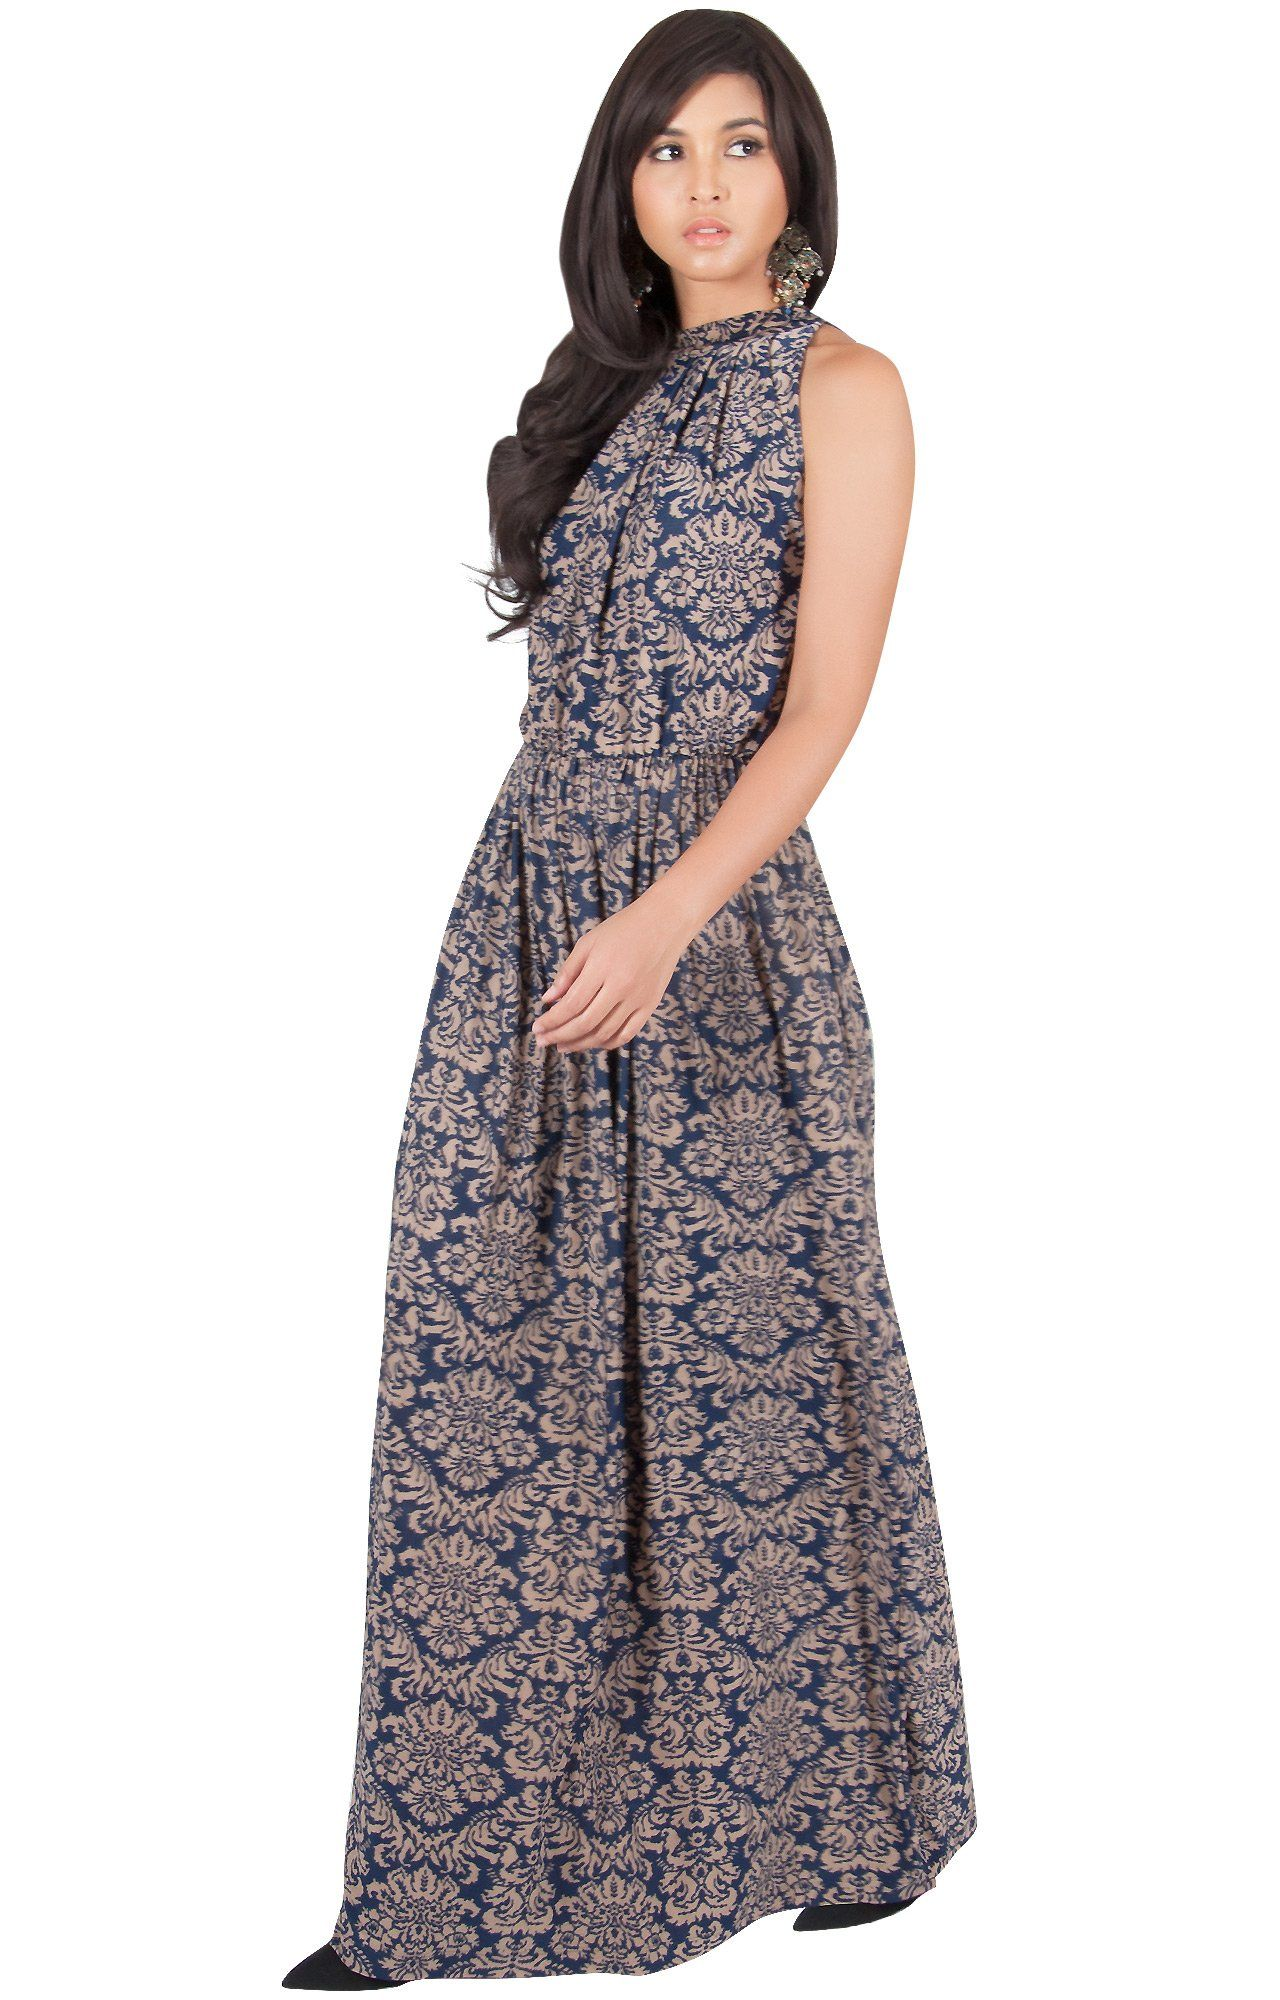 8246249cb8 Women Maternity Clothes - KOH KOH Womens Long Sexy Sleeveless Halter Neck  Summer Spring Formal Flowy